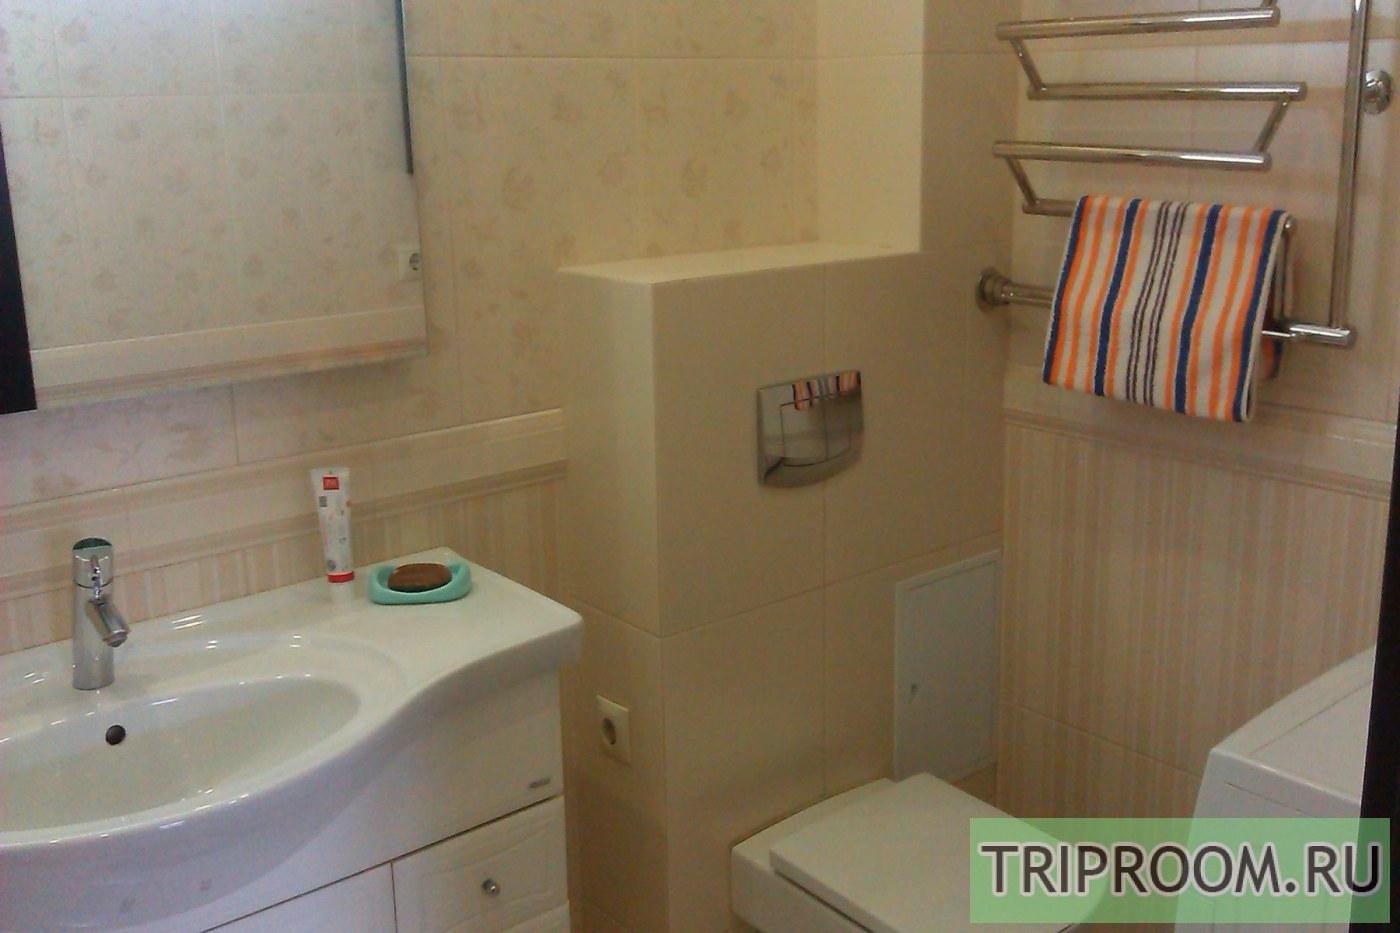 3-комнатная квартира посуточно (вариант № 39631), ул. Кирова улица, фото № 12